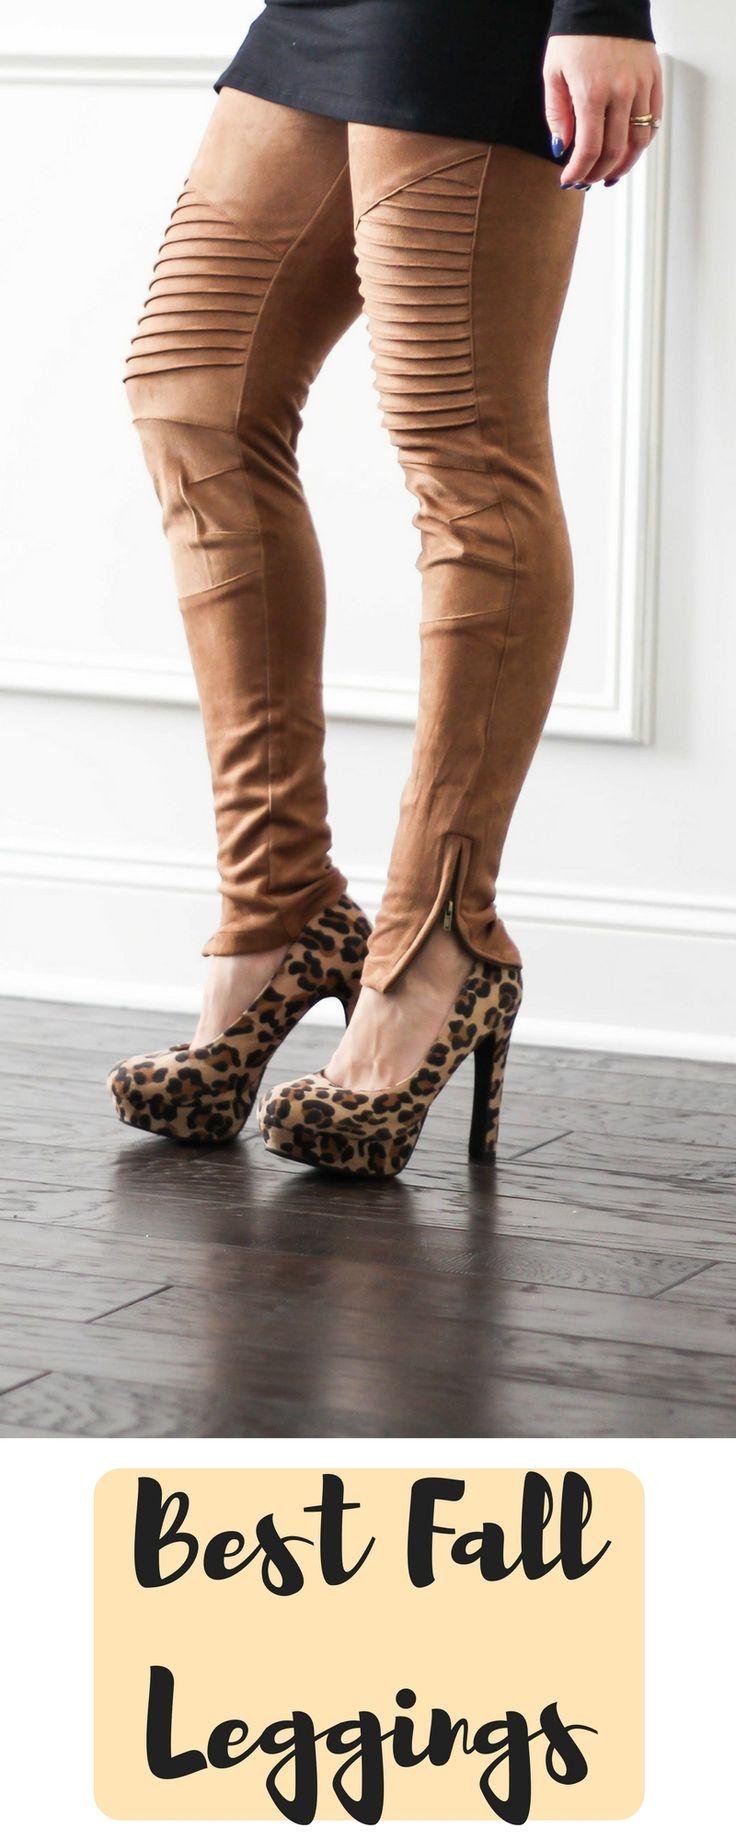 Fall Fashion | Fall Leggings | Faux Suede Leggings | Moto Leggings | Ankle Zipper | Winter Leggings | Dressy Leggings | Motherhood style | Motherhood Fashion | Maternity | PinkBlush | Animal Print |